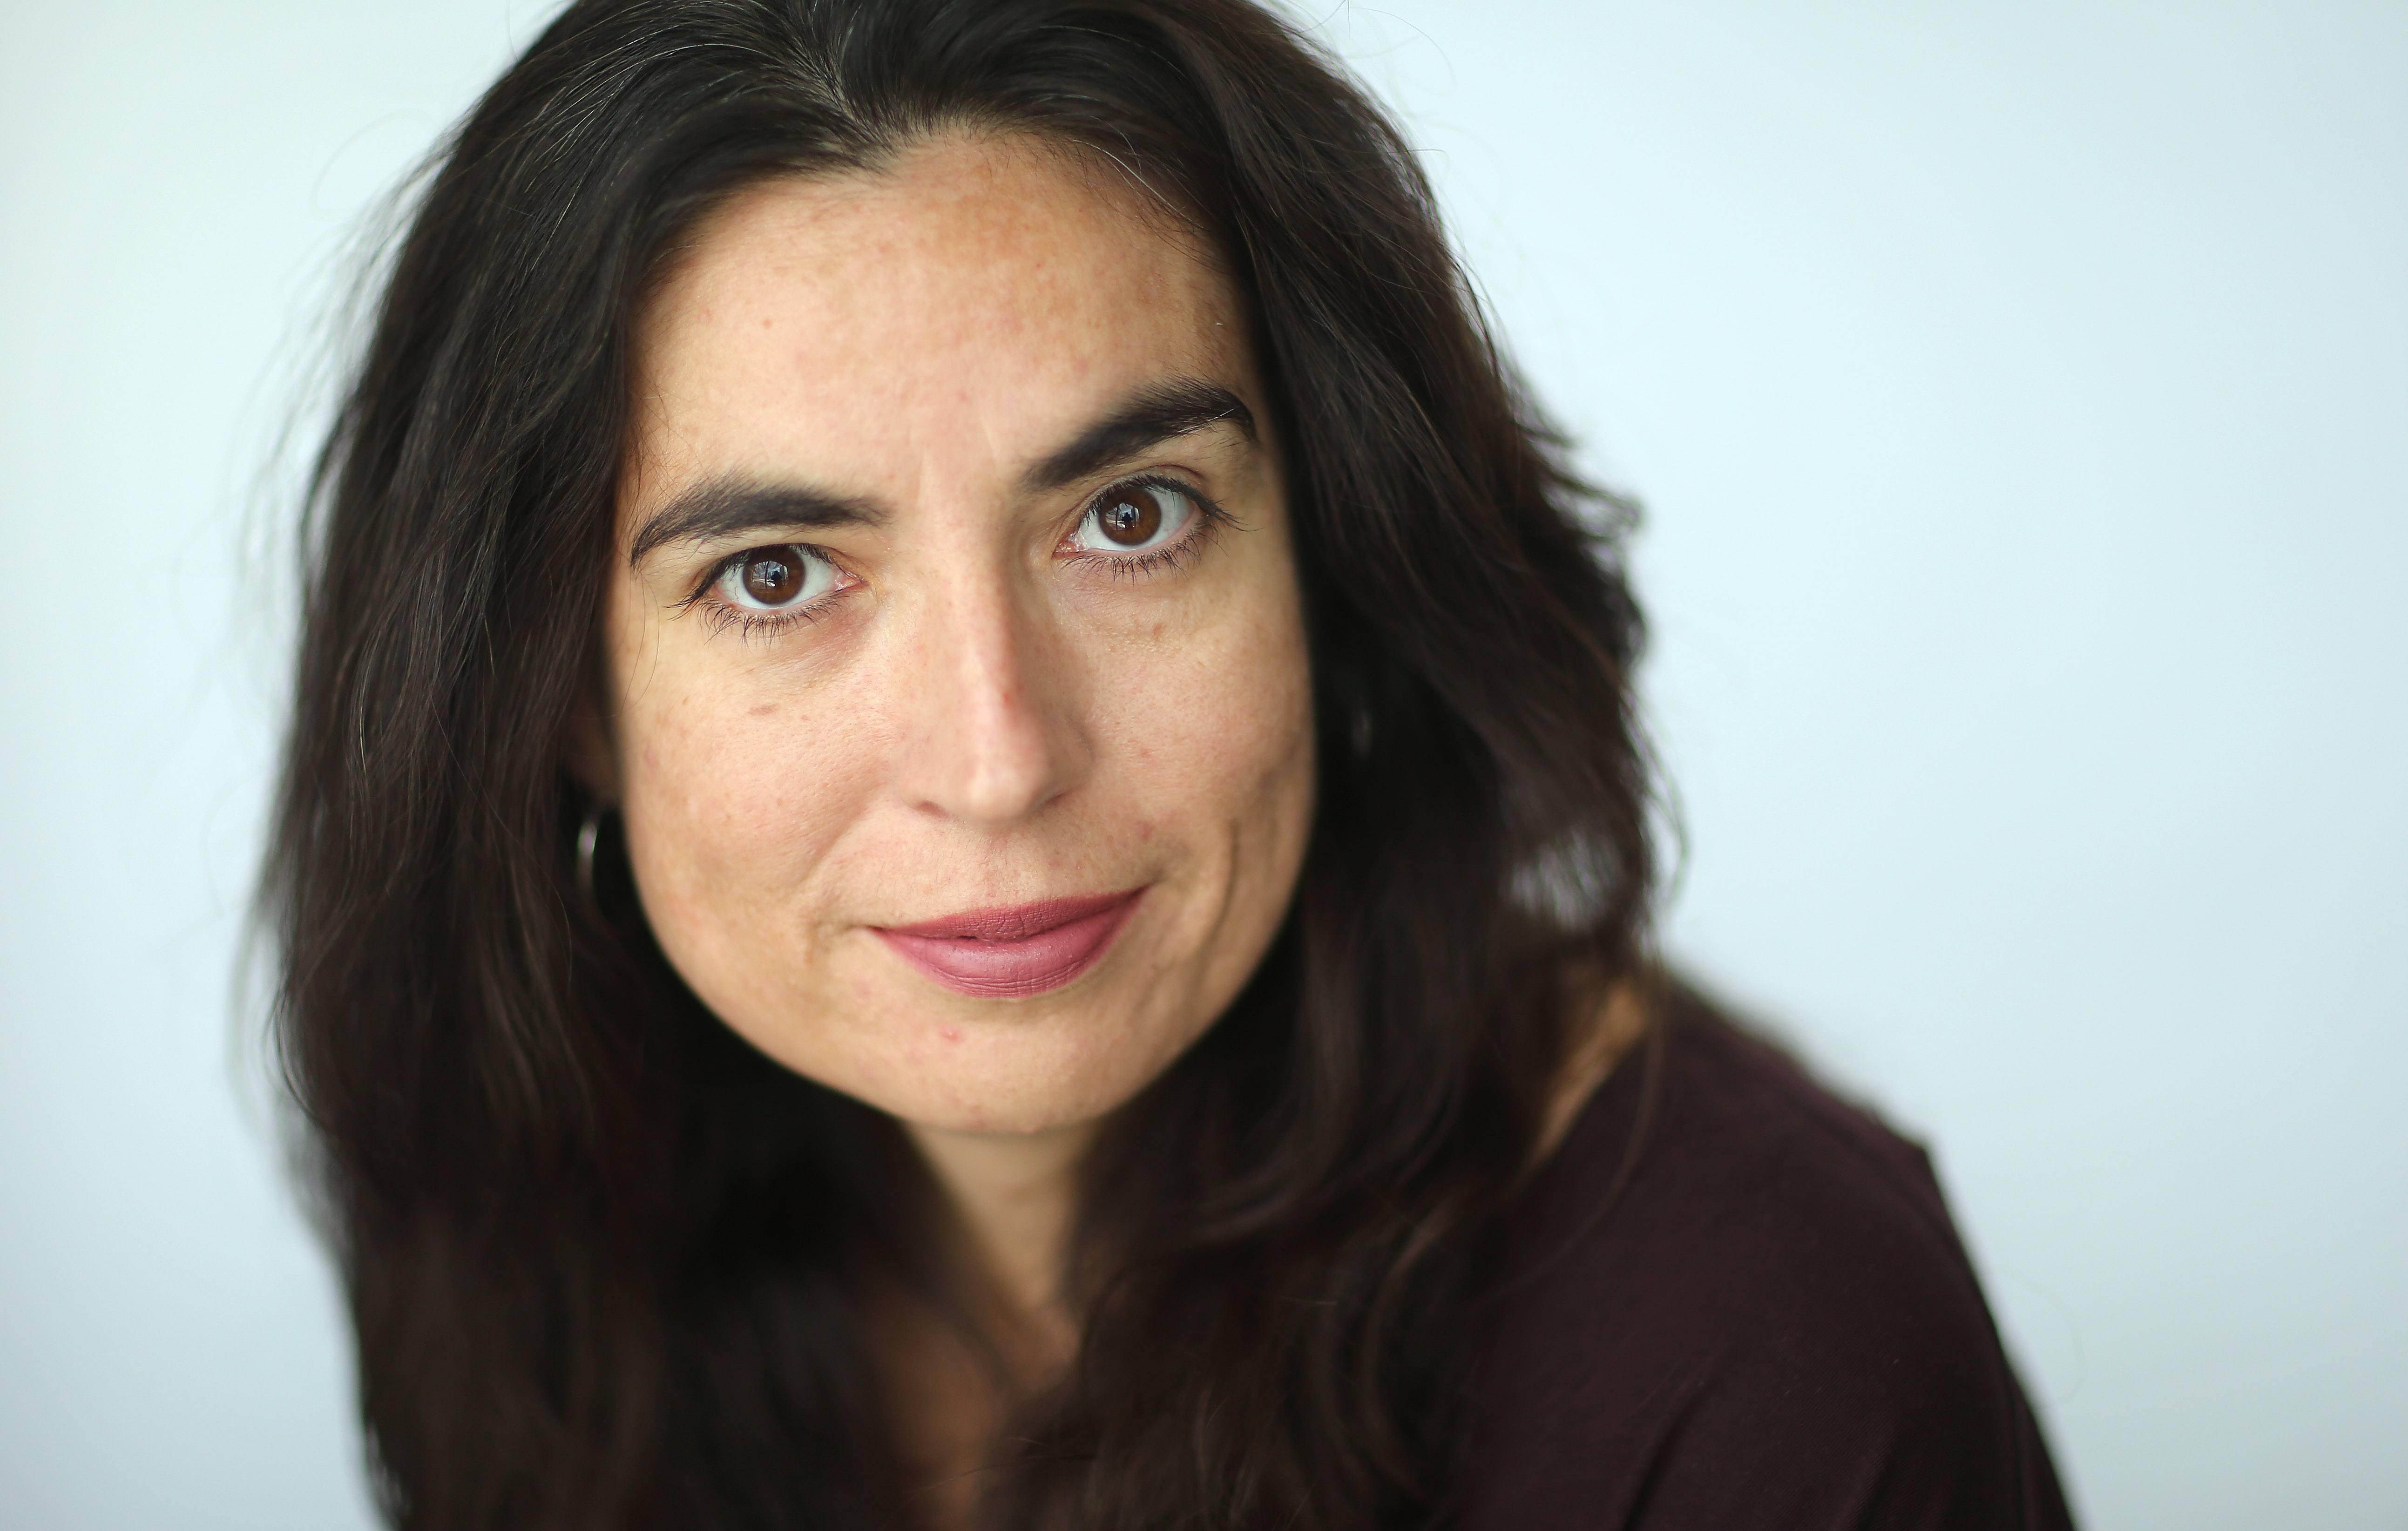 Tanya Talaga logo headshot, headshotlogo logoheadshot in Toronto.   November 15, 2012  STEVE RUSSELL/TORONTO STAR